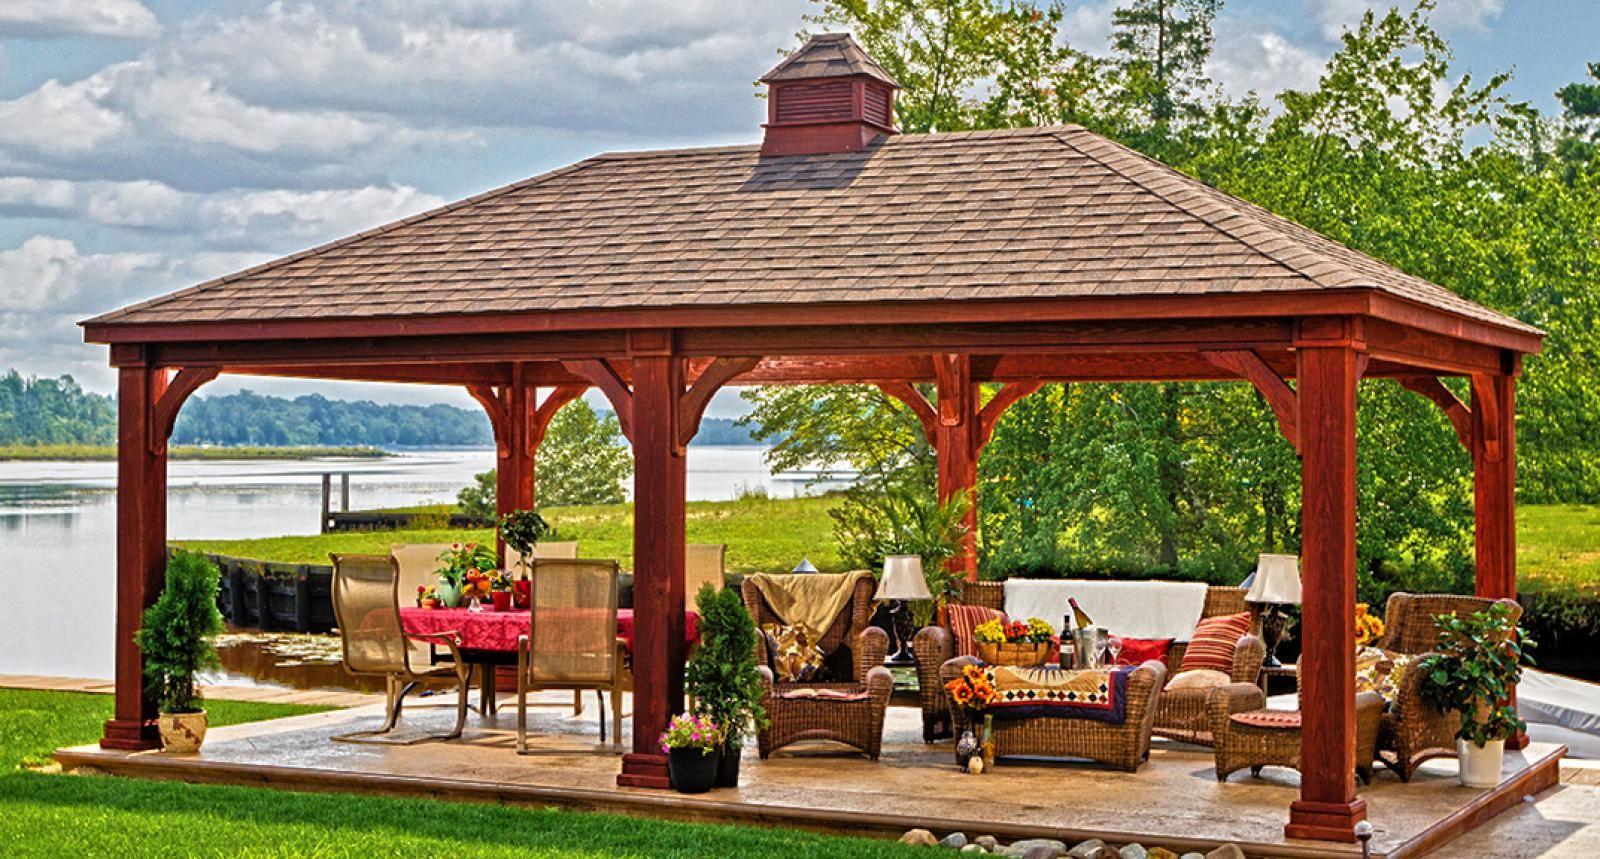 Wood Pavilion With Decorative Cupola